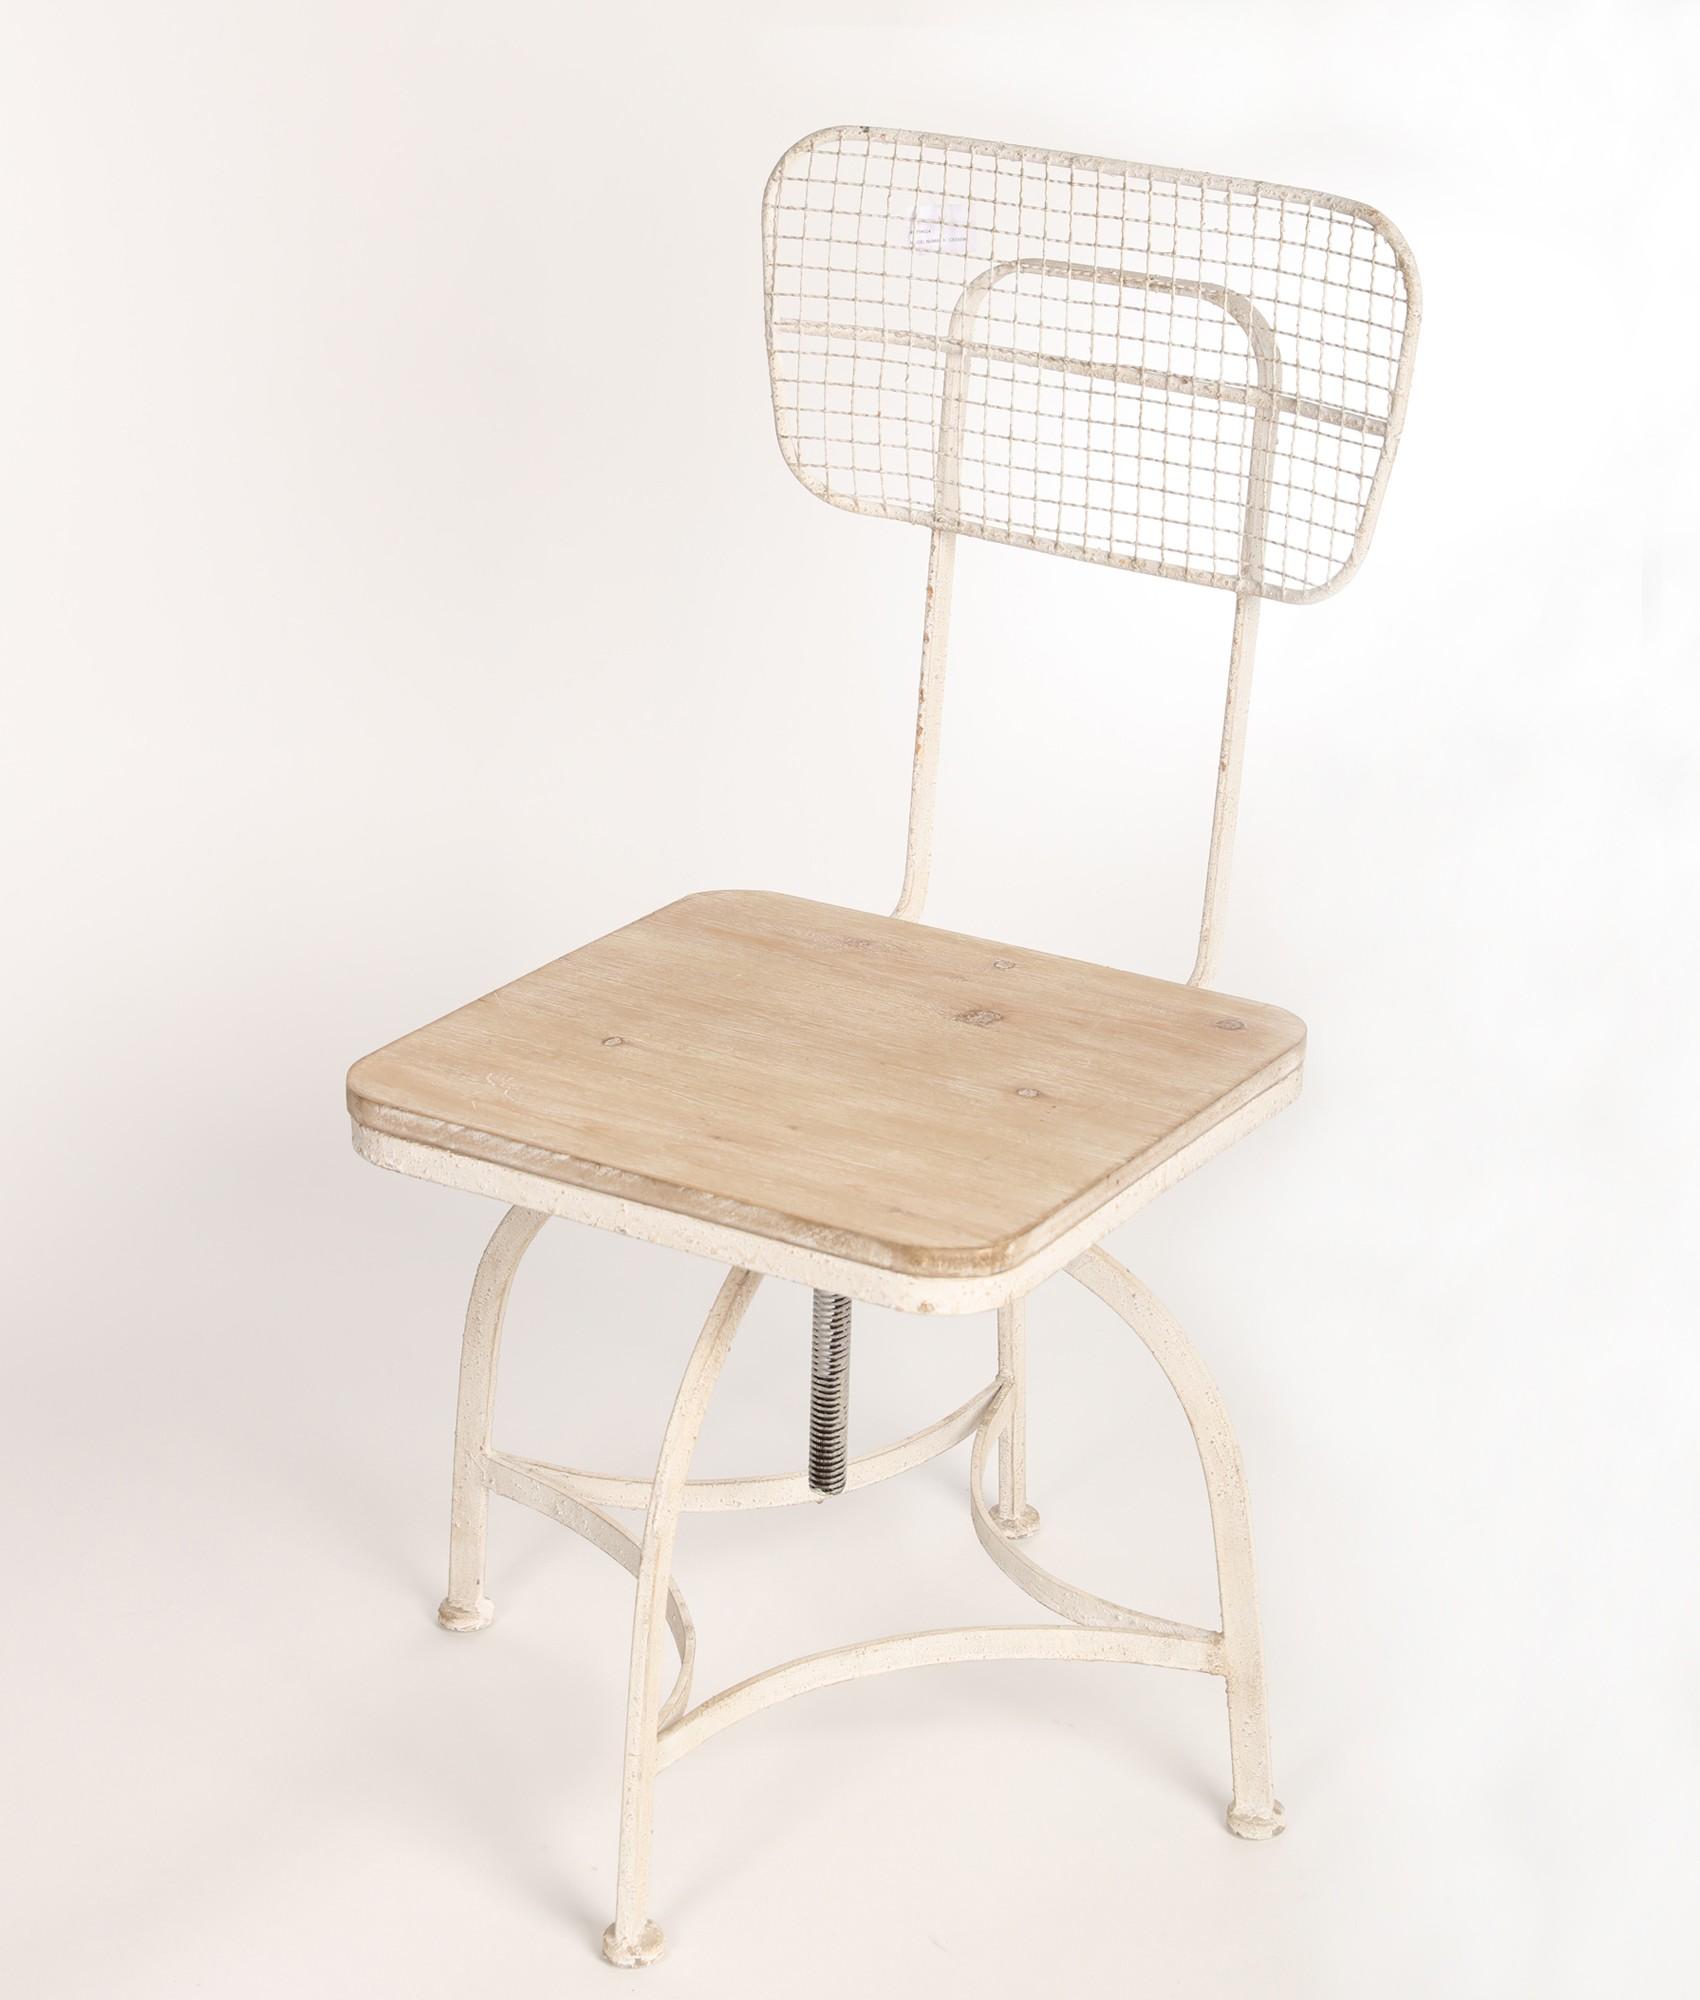 Stolička Vintage štýl, kovu a dreva Antyki24